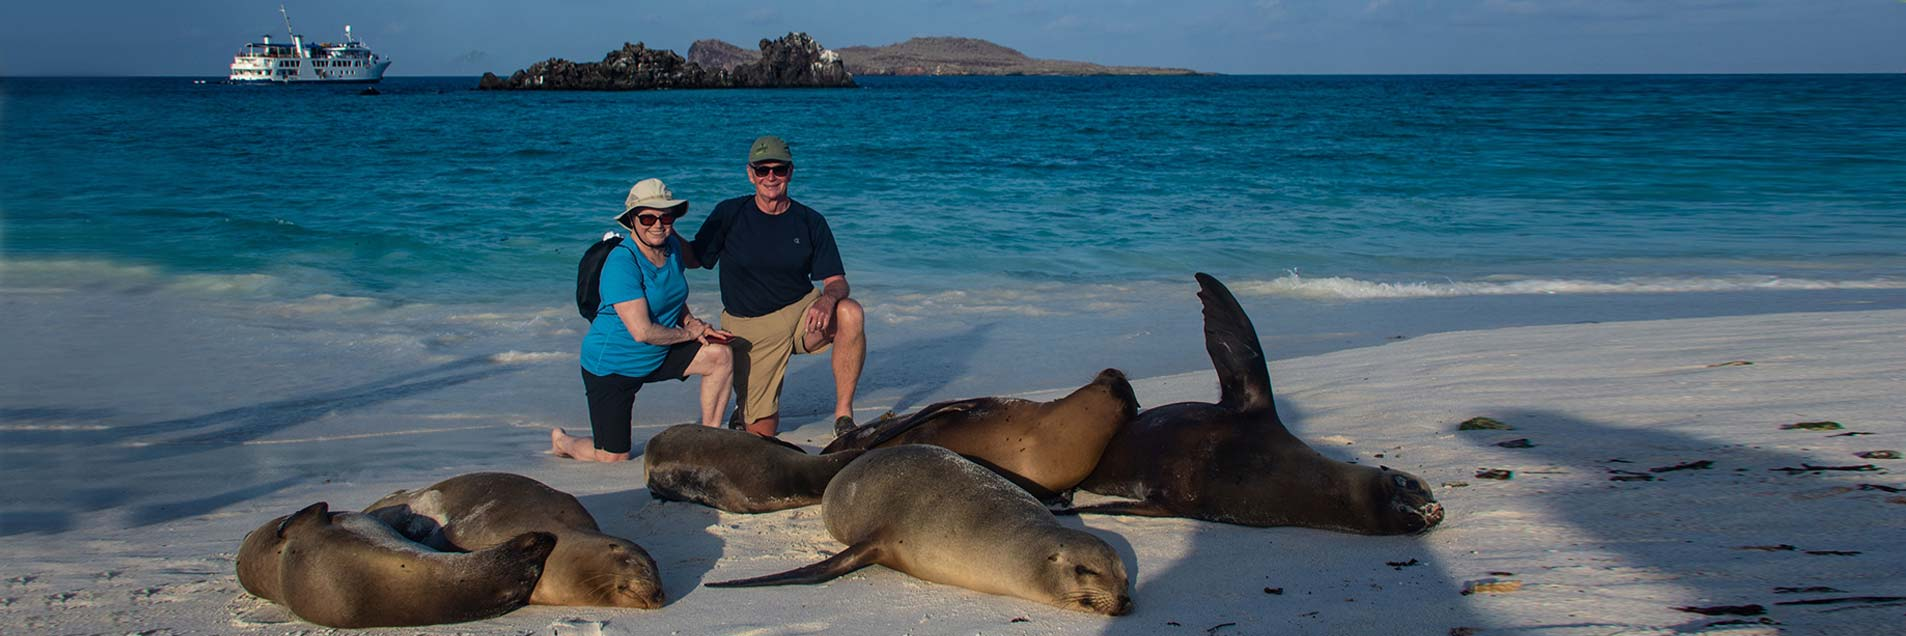 Galapagos wildlife: sea lions